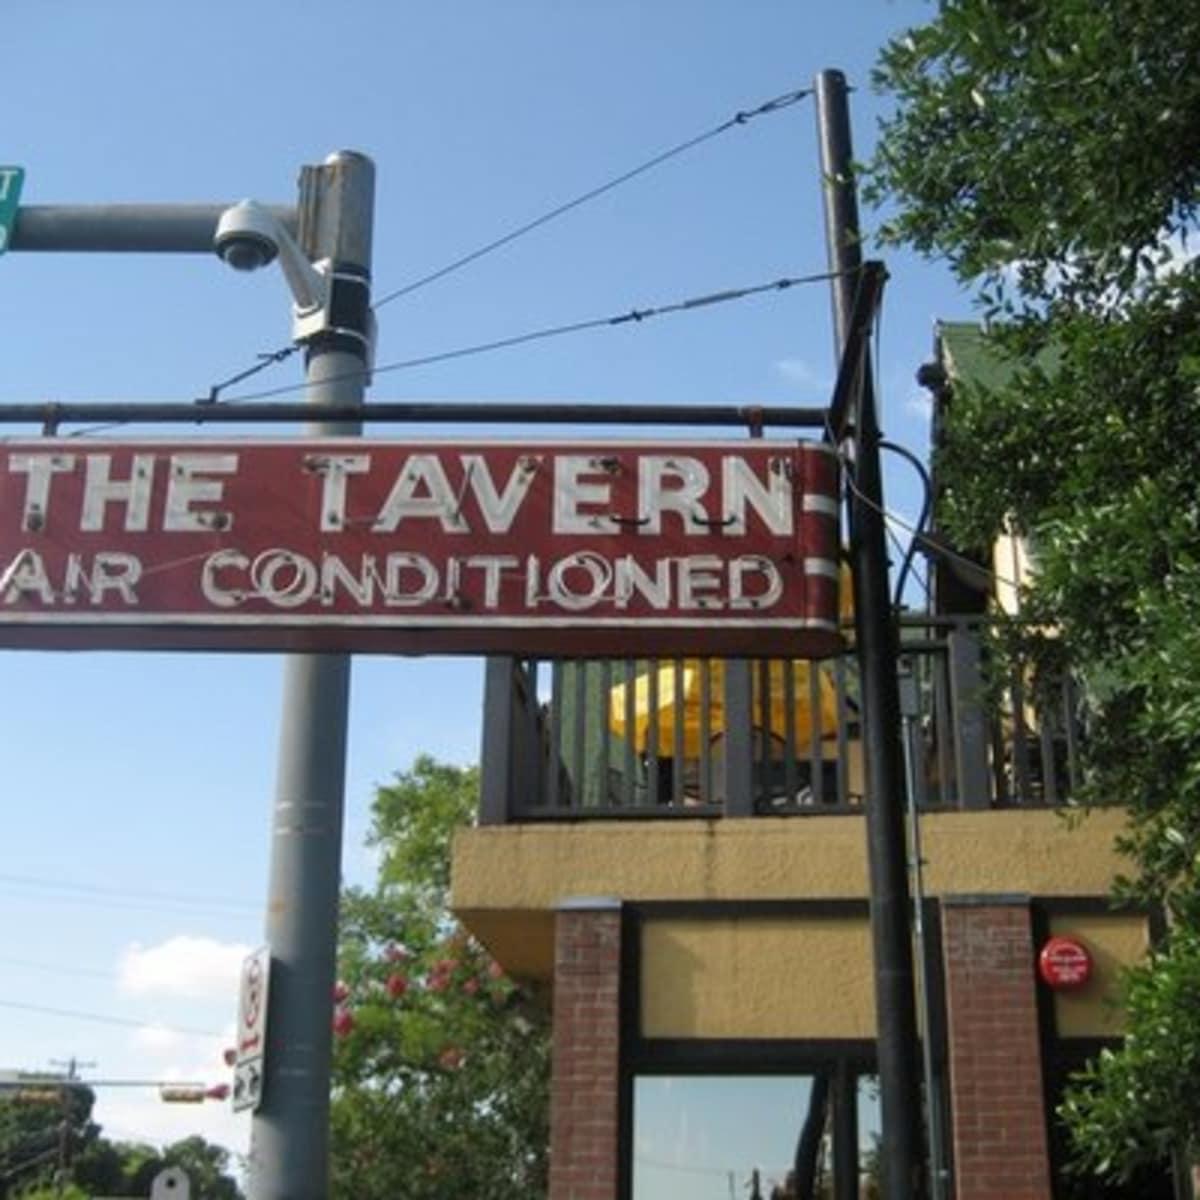 Austin Photo: Places_food_the tavern_exterior